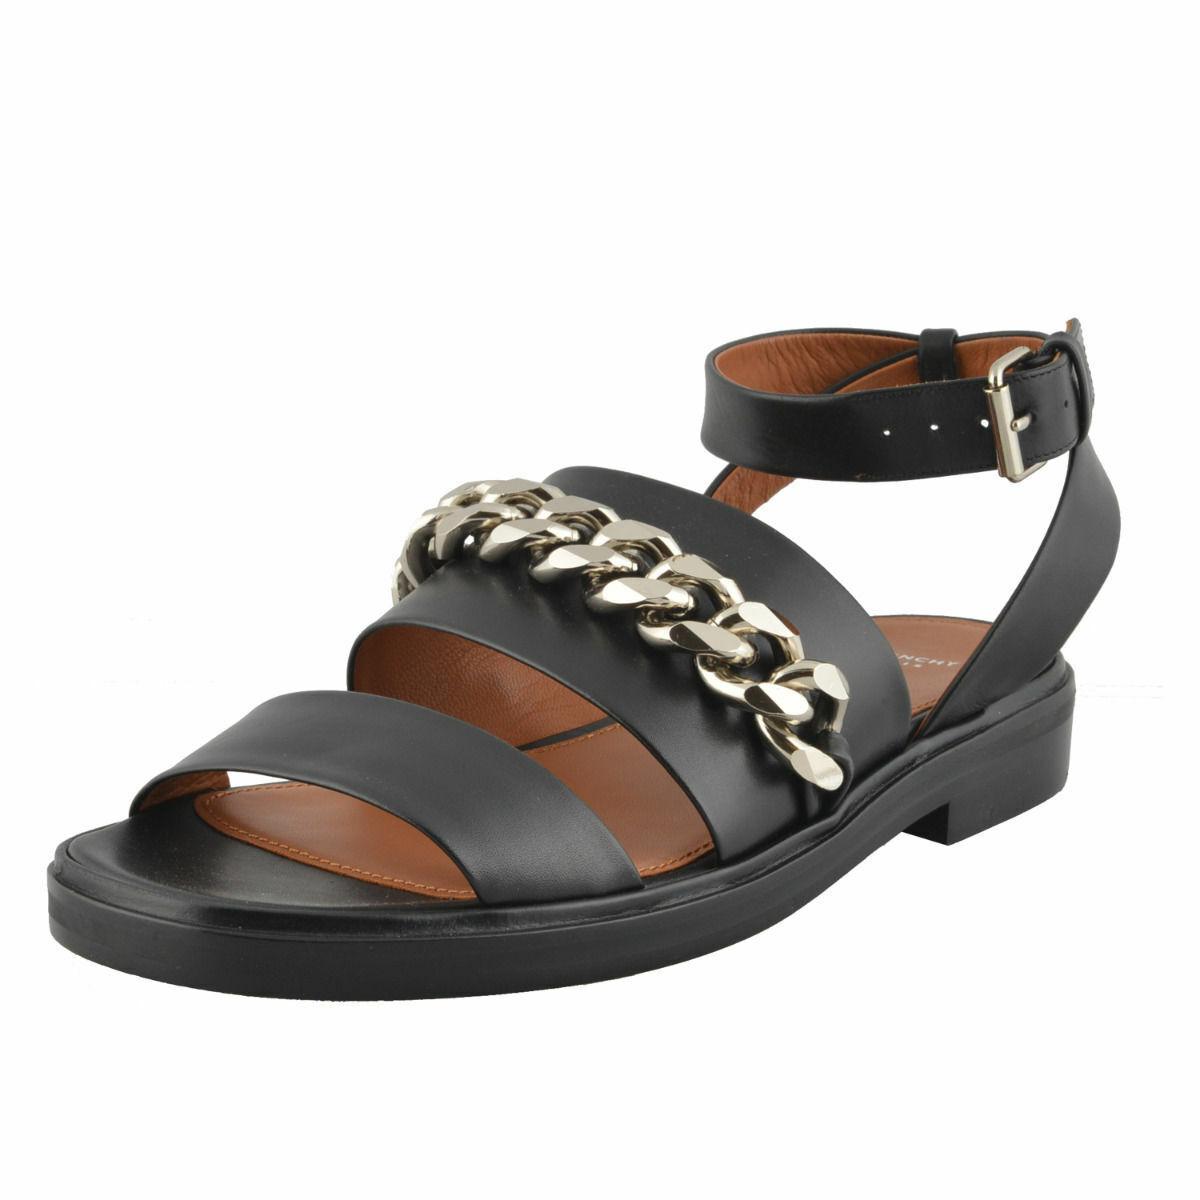 Givenchy Women's Black Leather Sandals Ankle Strap shoes Sz 7 10 11